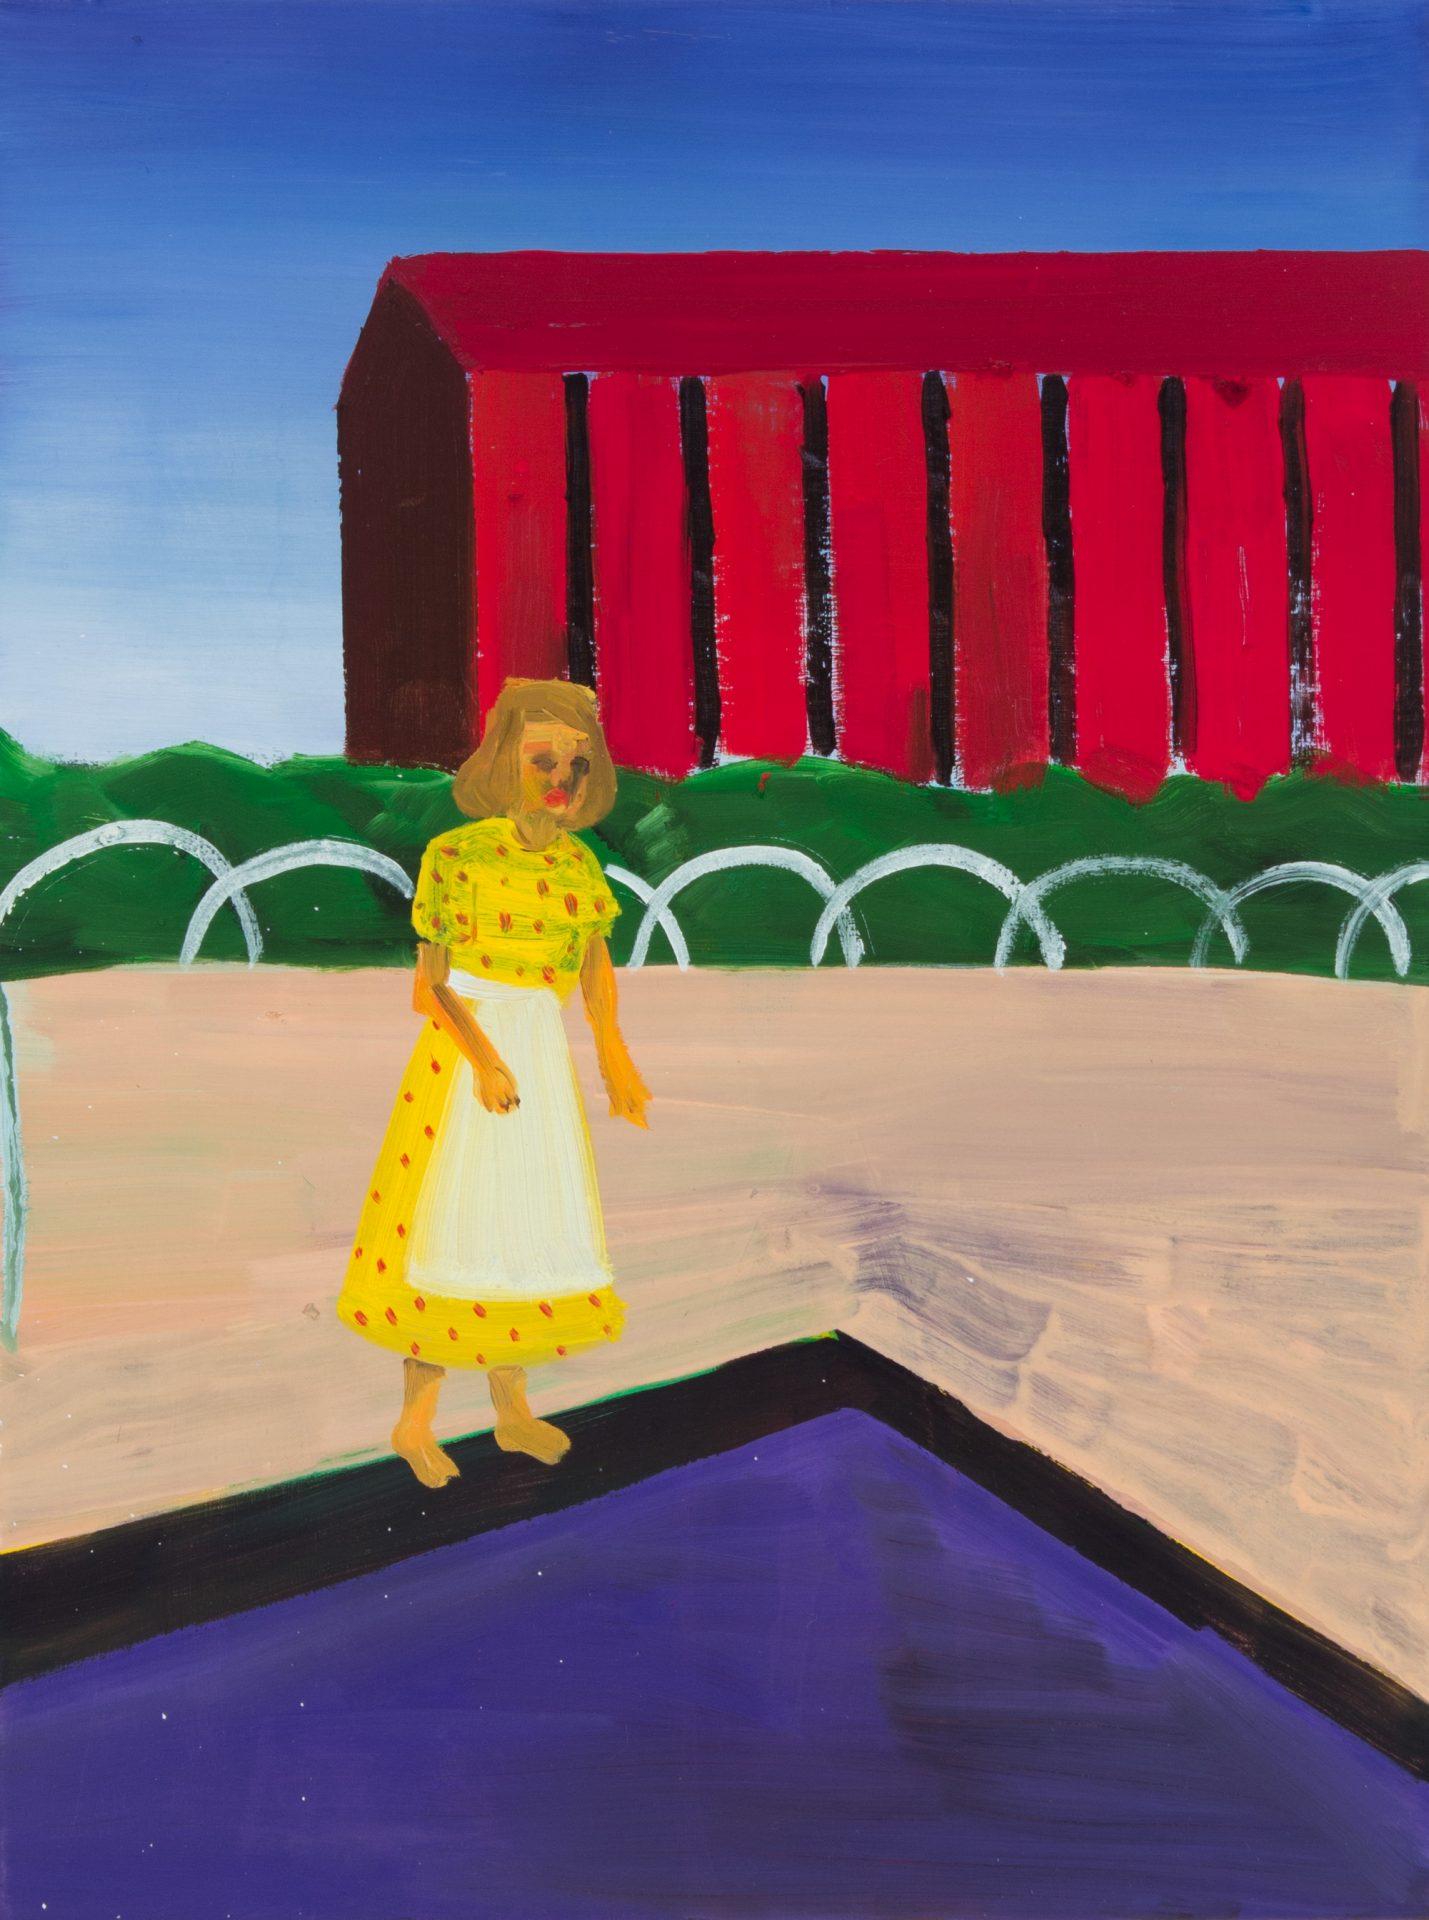 黃海欣 Huang HaiHsin, 無題 Untitled, 2020, 畫布油彩 oil on canvas, 40 x 30 cm-3